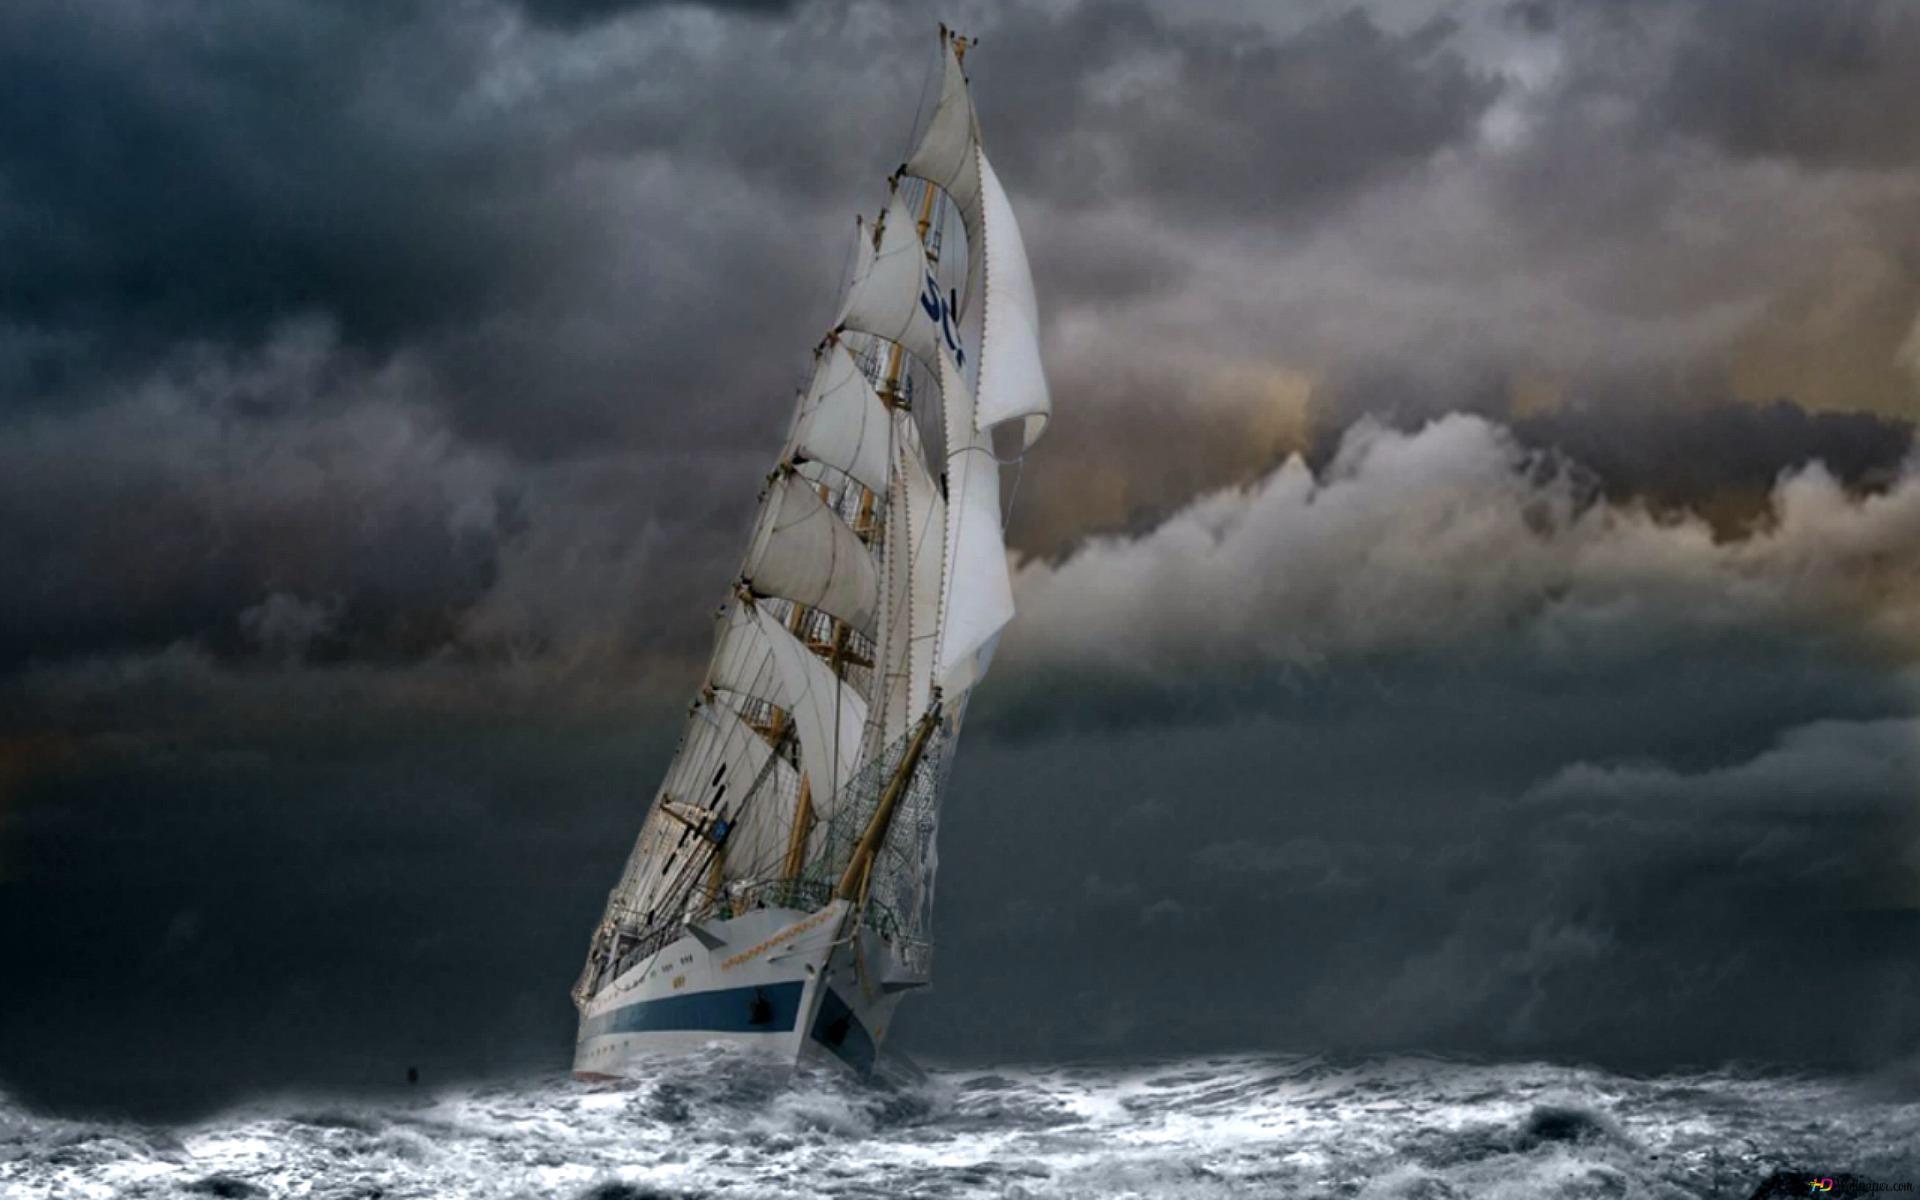 Voilier Sur Mer Stormy Hd Fond D Ecran Telecharger